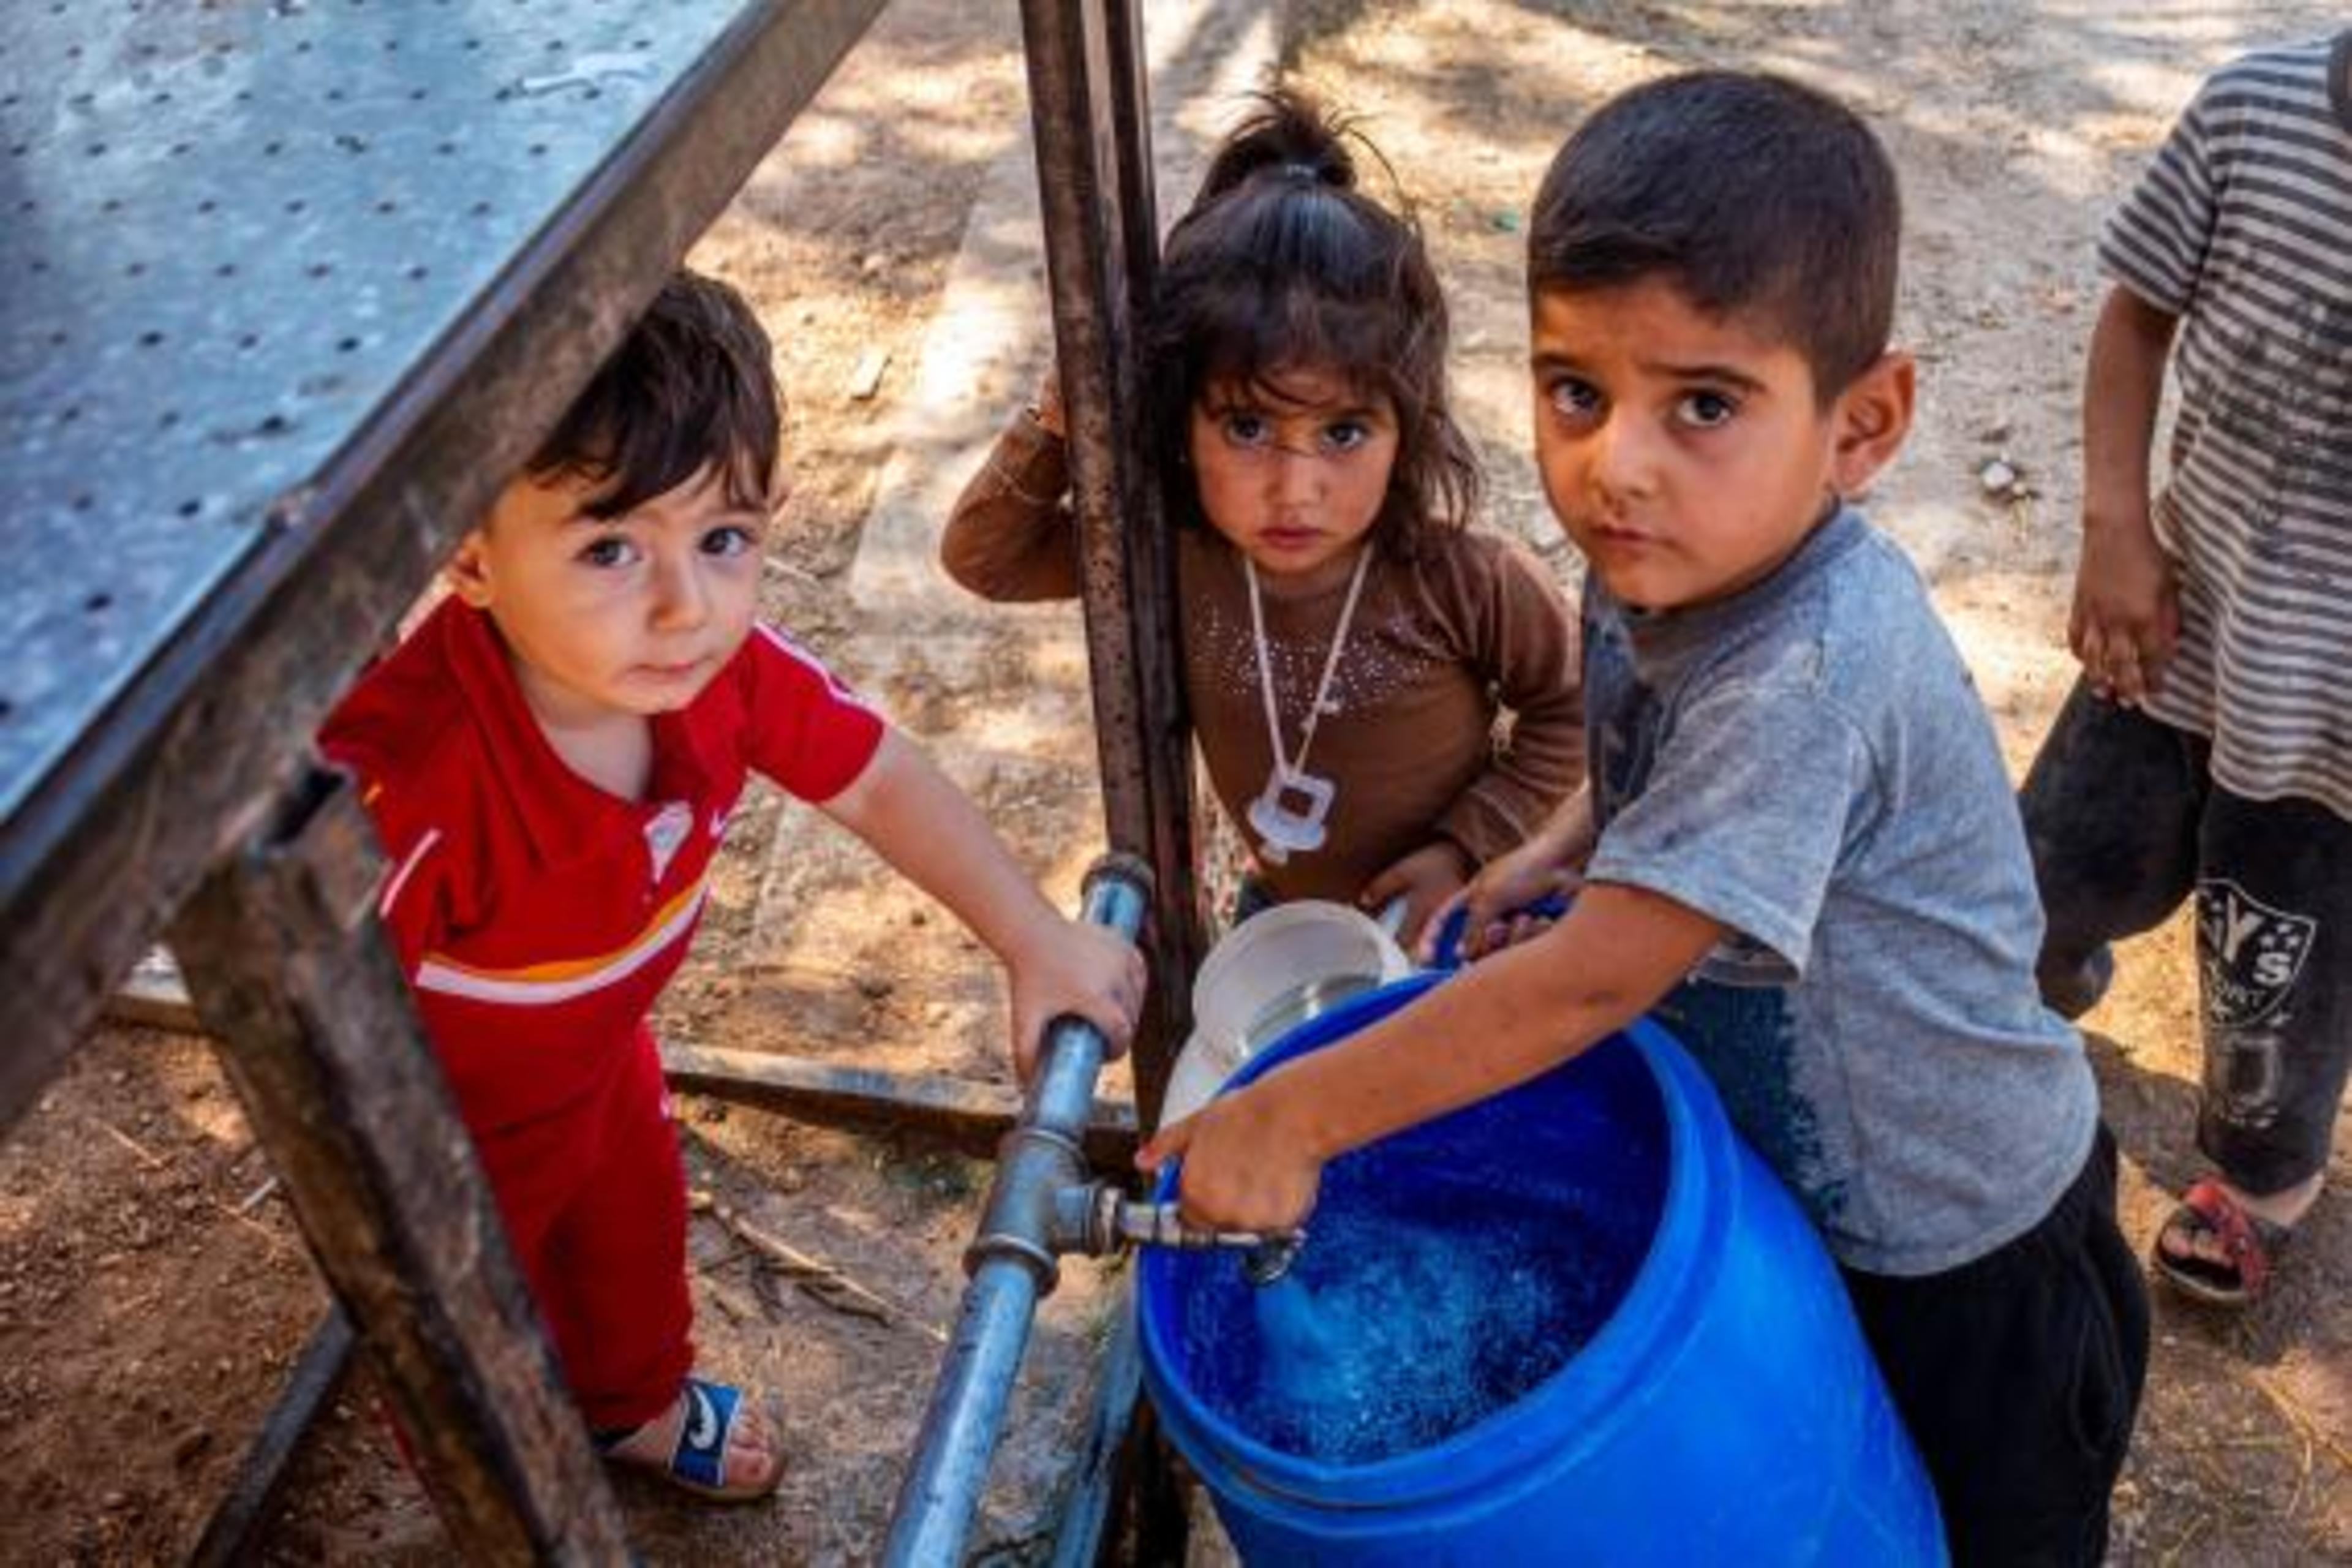 UNICEF/UN0398428/Chnkdji